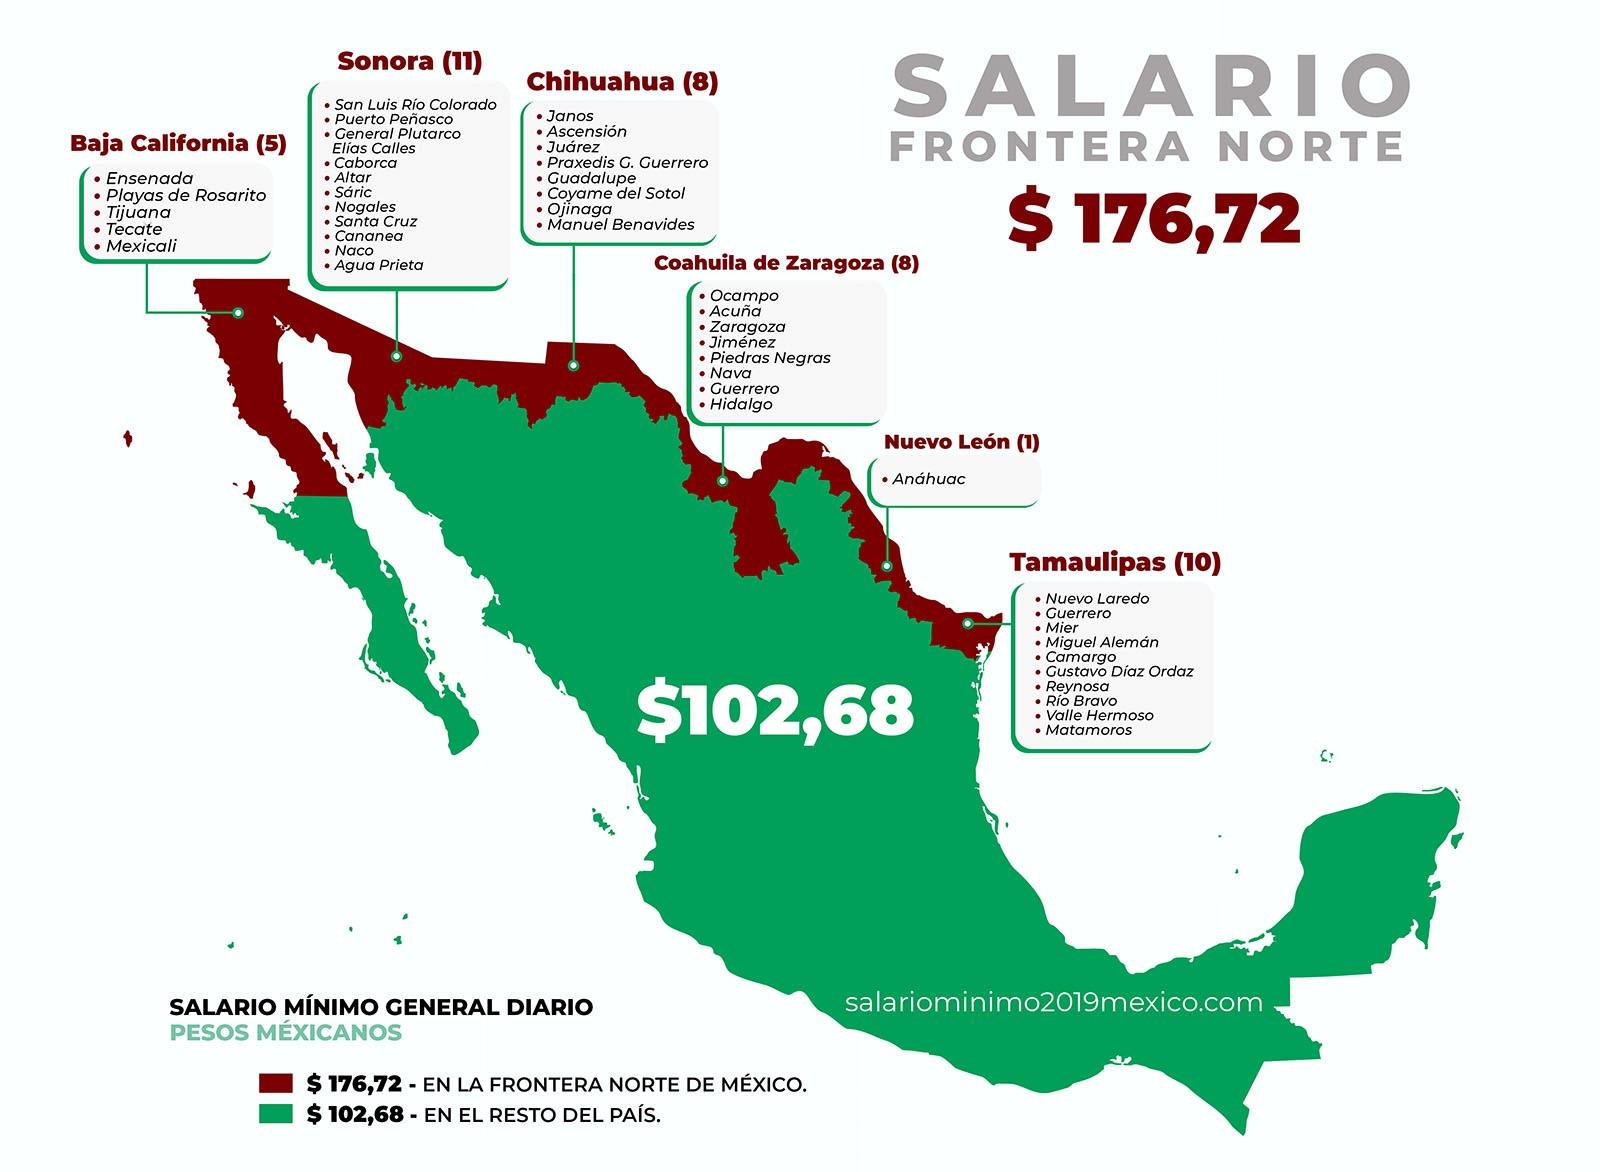 salario minimo mexico